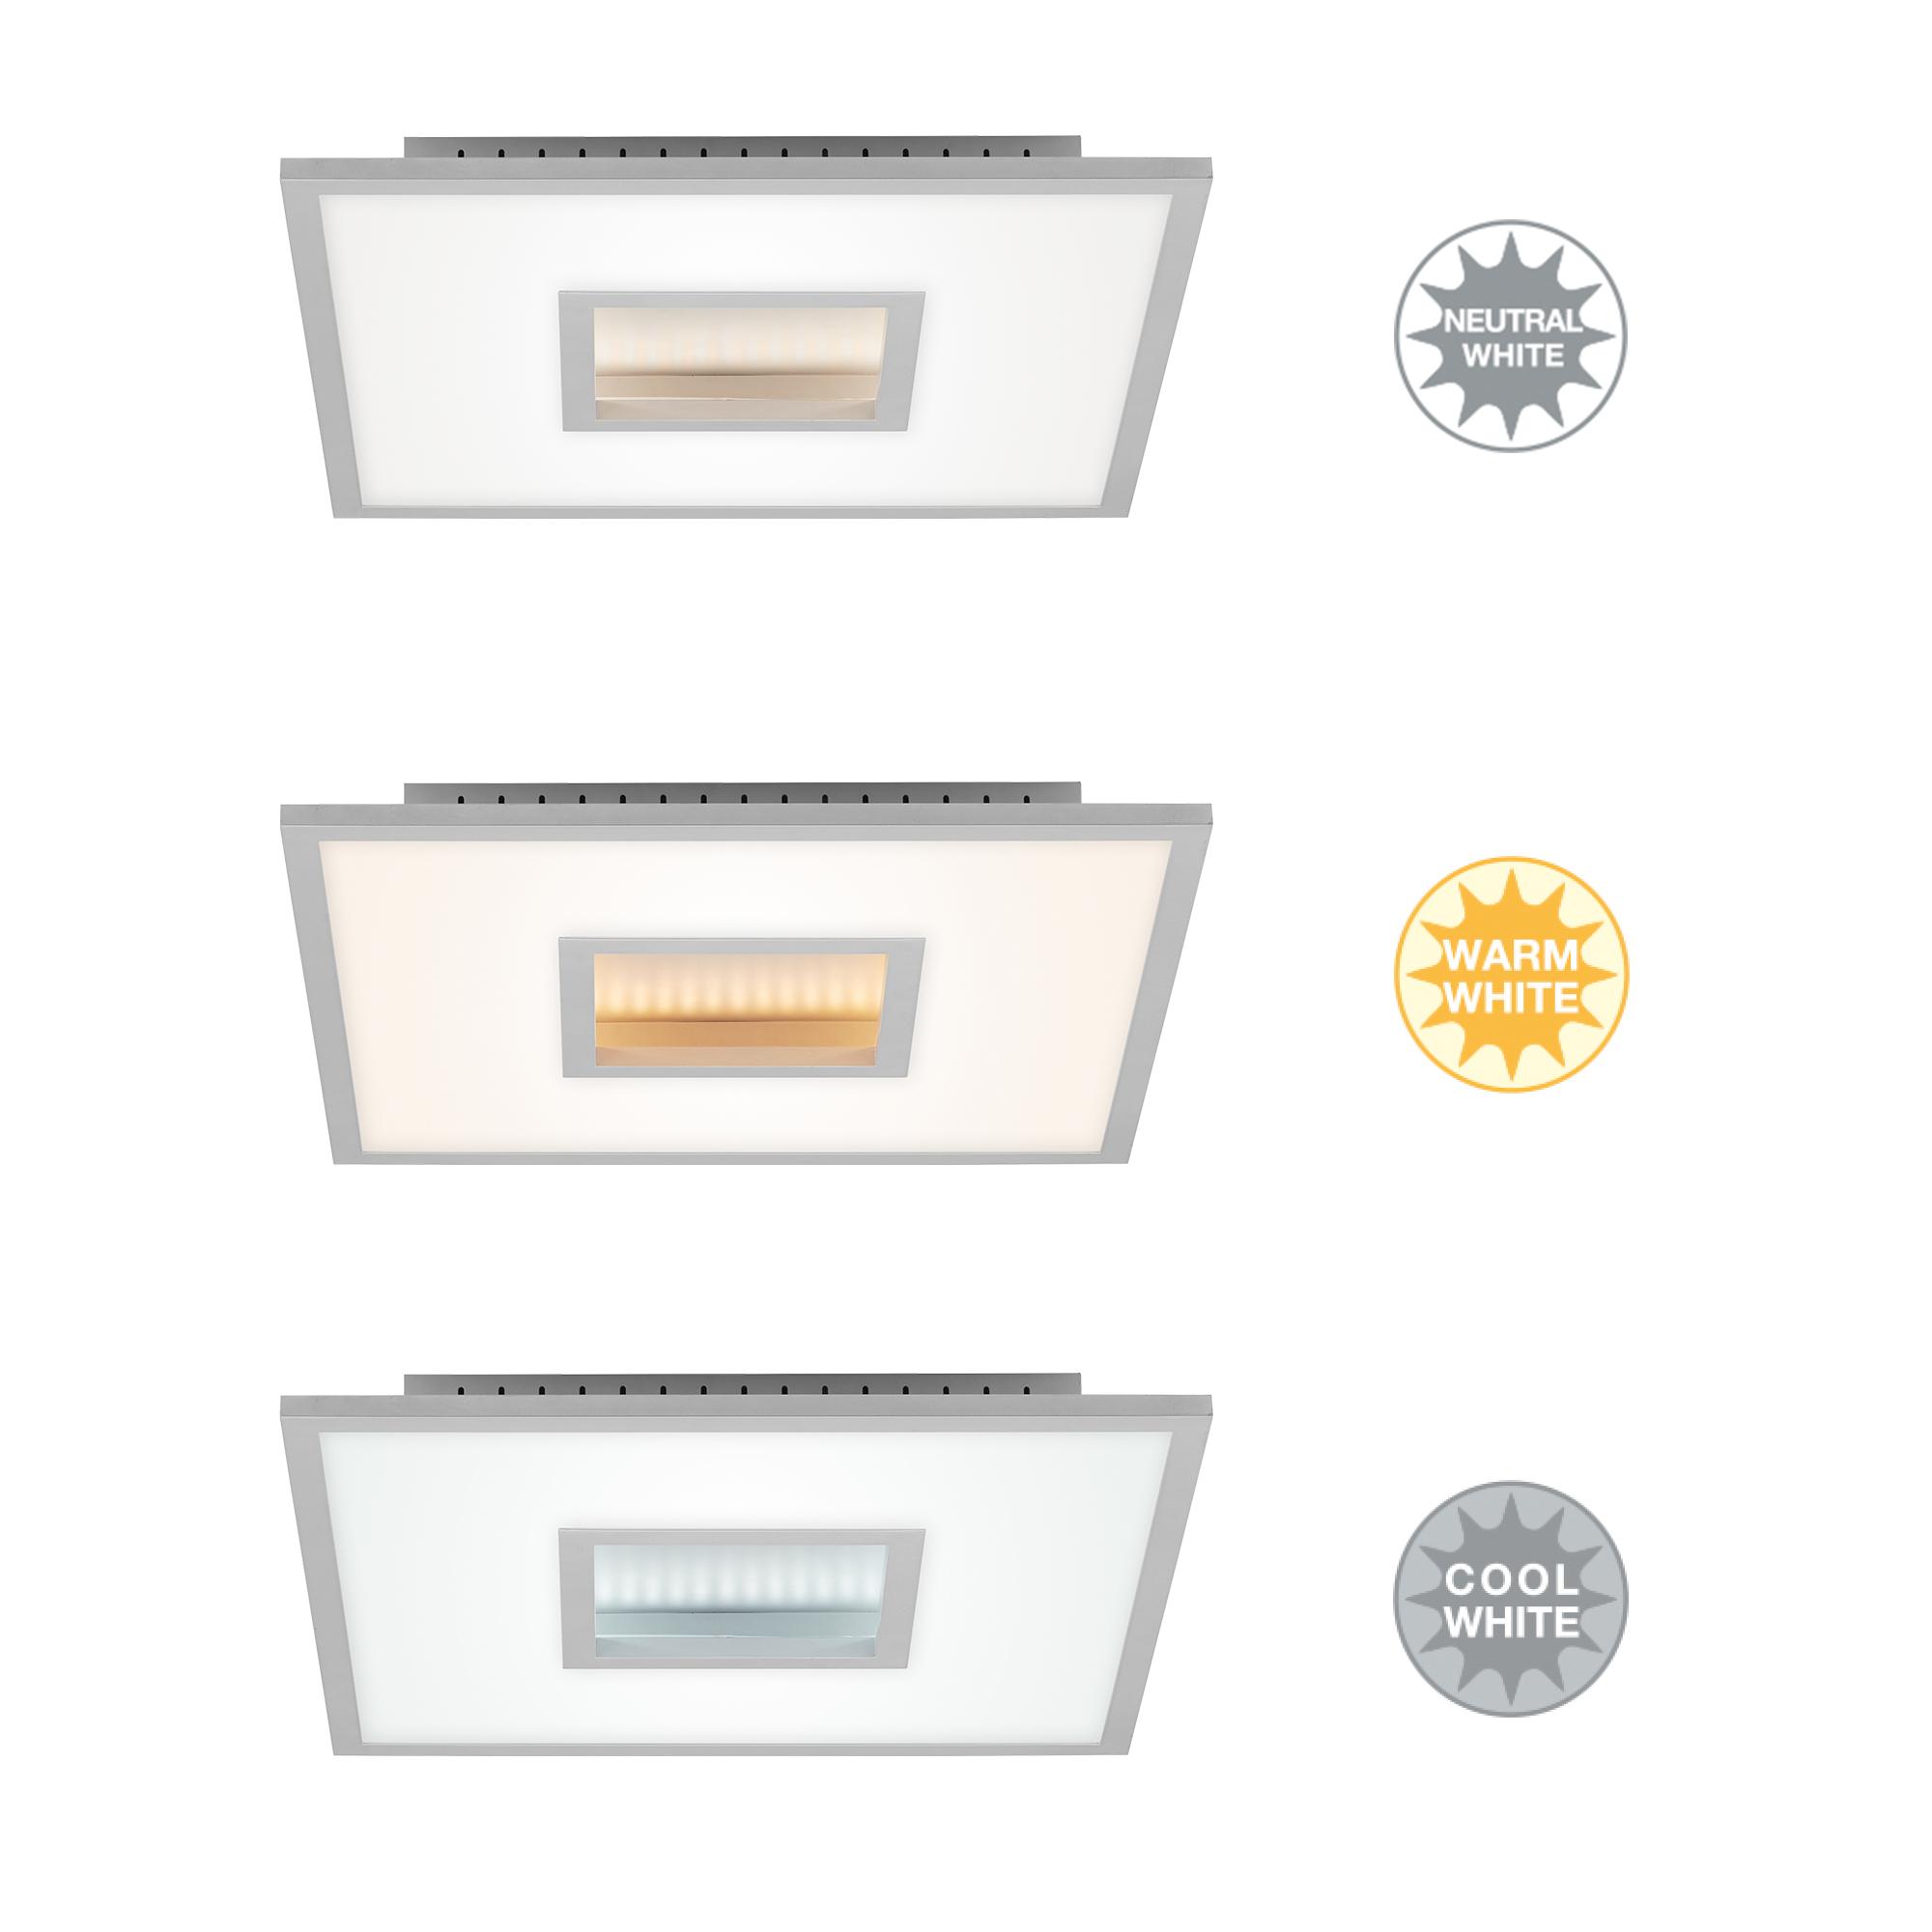 CCT LED Deckenleuchte, 45 cm, 26 W, Chrom-Matt